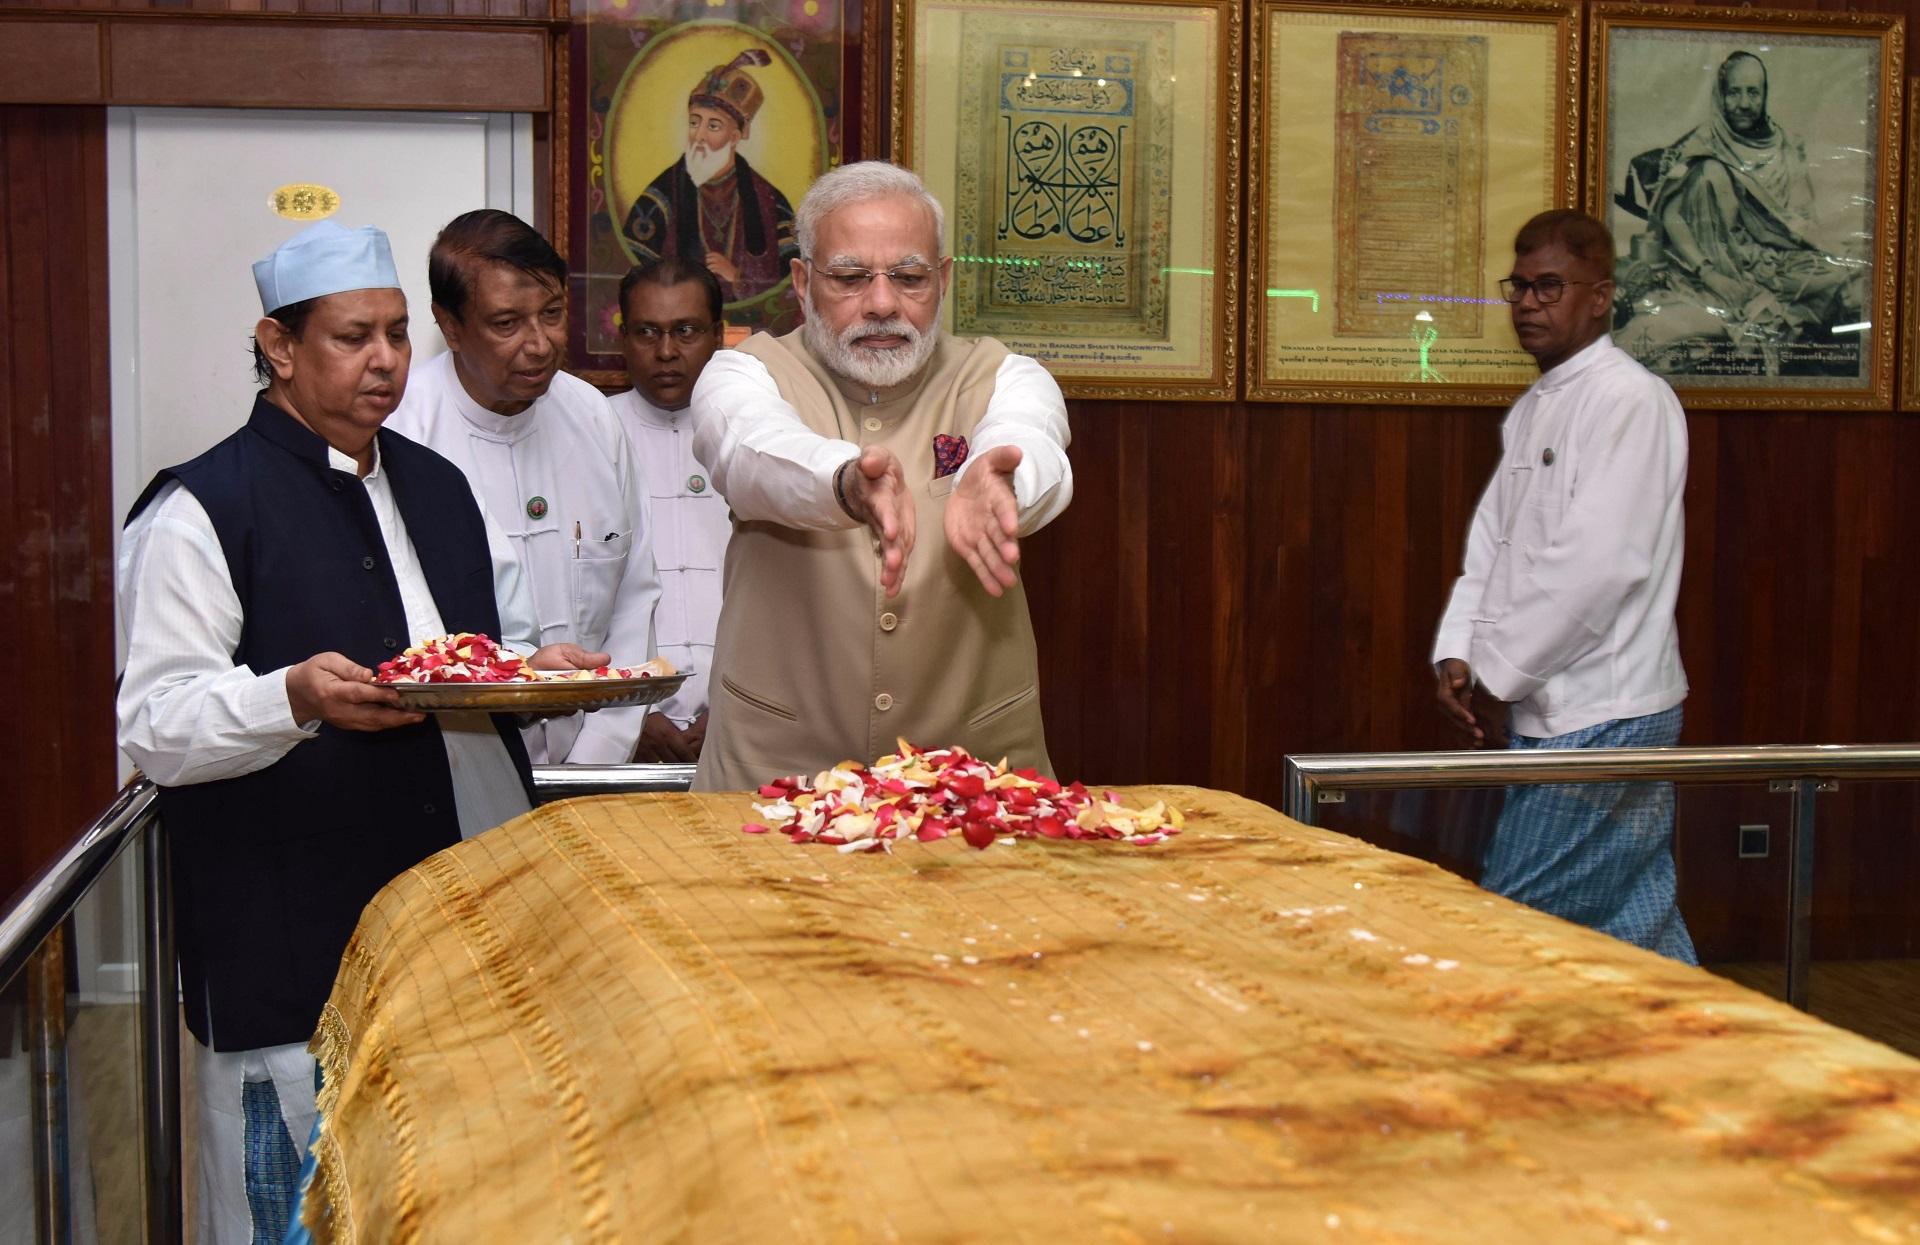 The Indian Prime Minister Narendra Modi visited the Mazaar (shrine) of last Mughal emperor Bahadur Shah Zafar in September 2017.